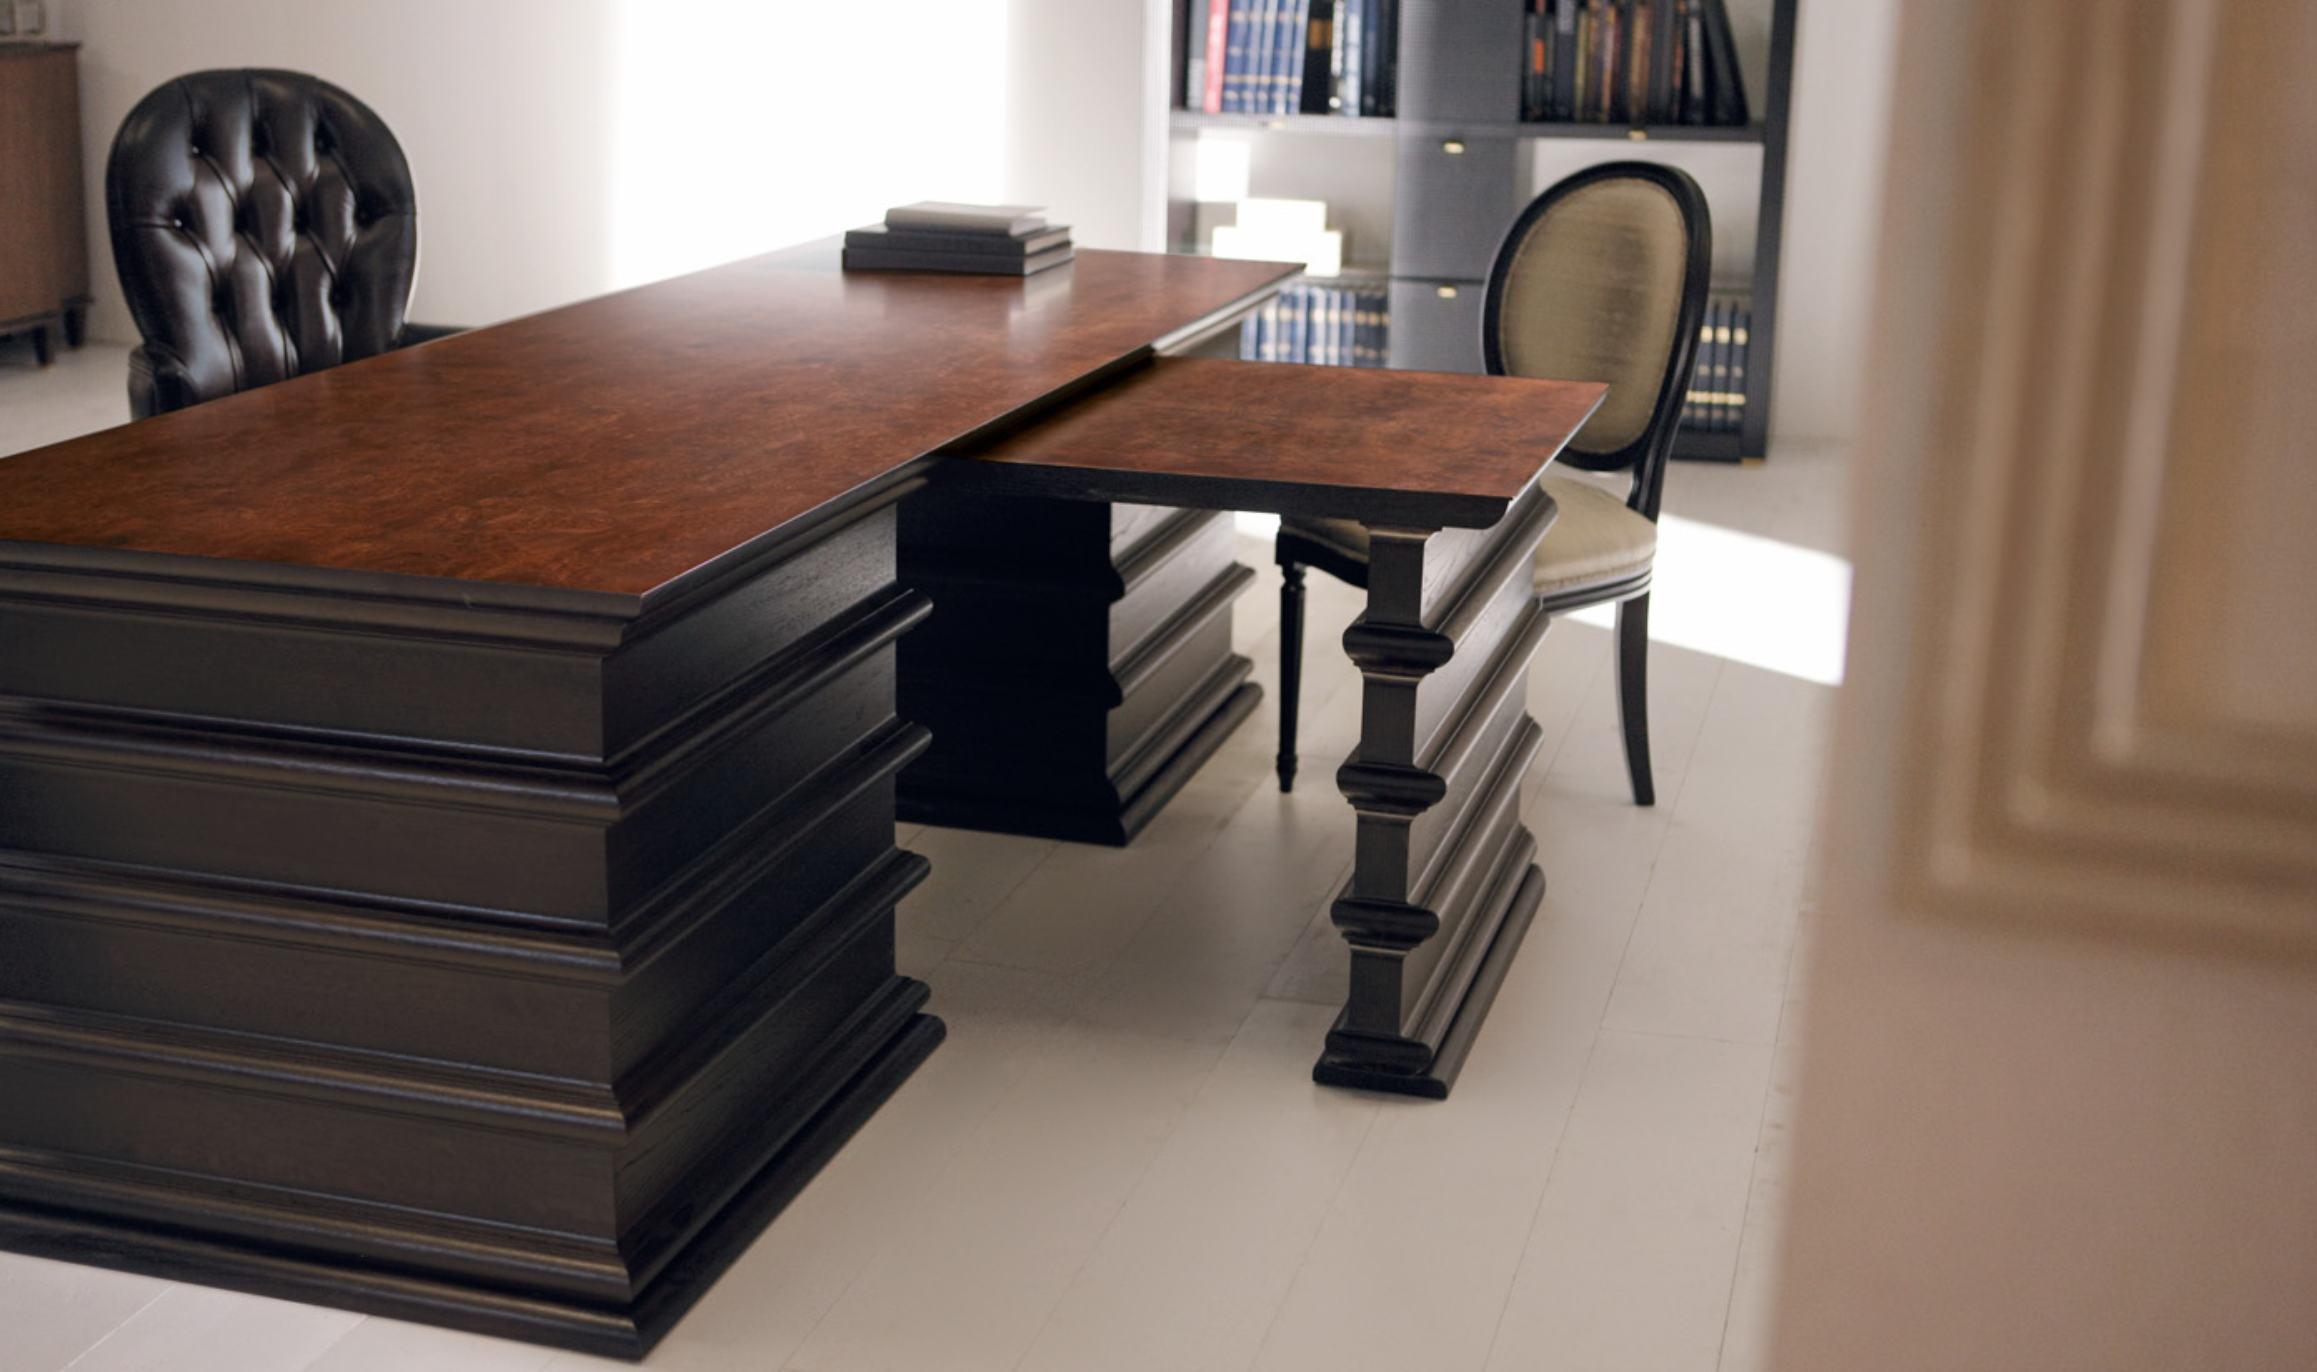 Письменный стол angelo cappellini 48002 palazzo mobili.